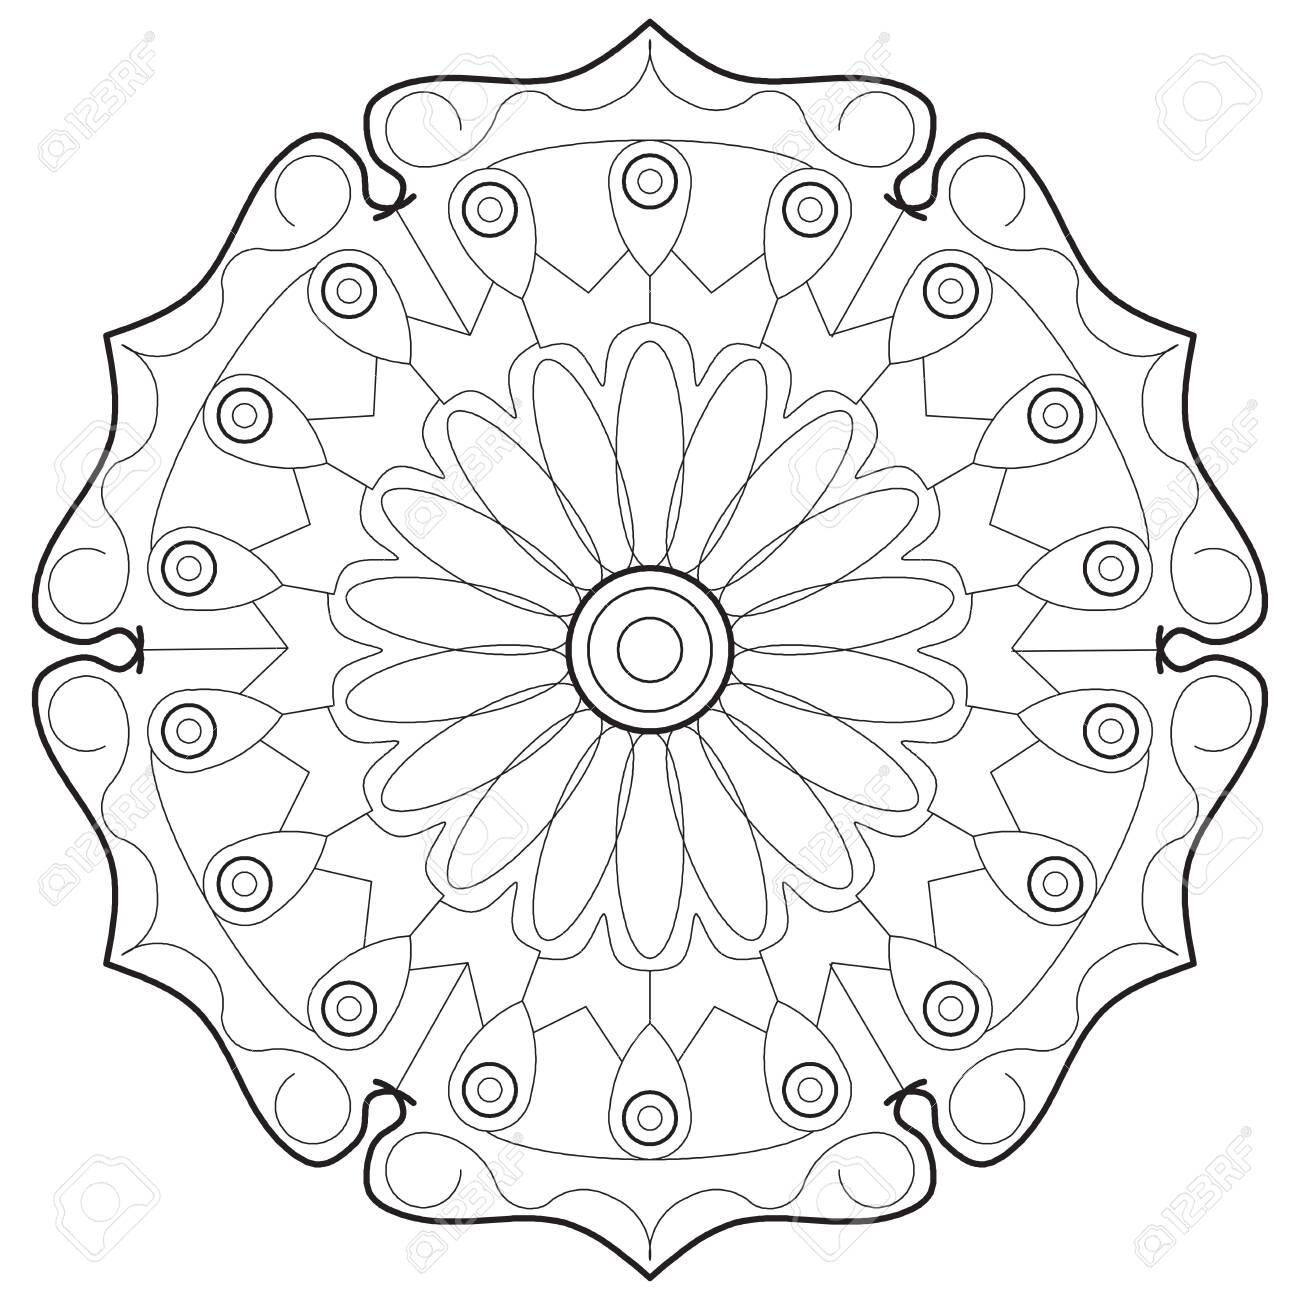 Coloring madalas. adult coloring . madalas coloring on white background. Mandalas art therapy & healing. - 152031293